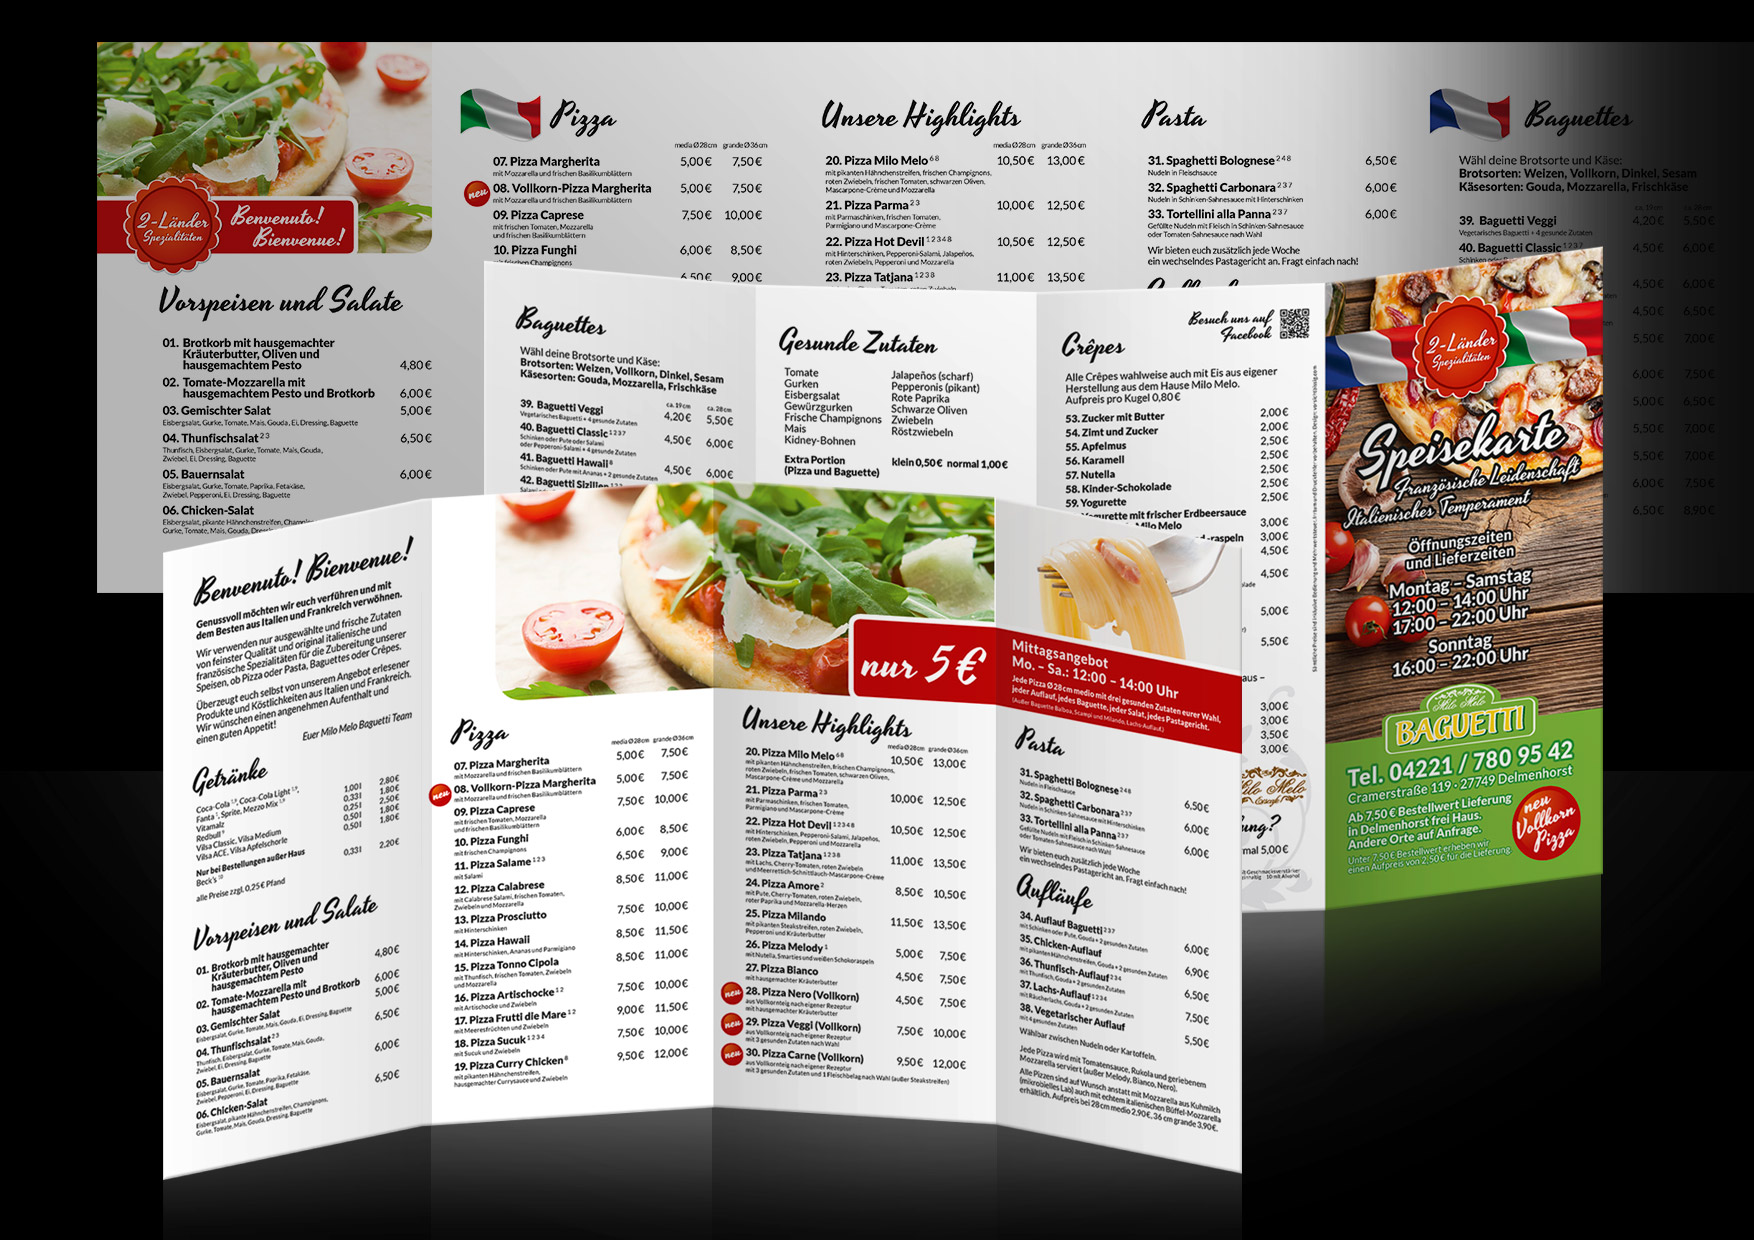 Werbung-Speisekarte-Pizzeria-Baguetti-Delmenhorst